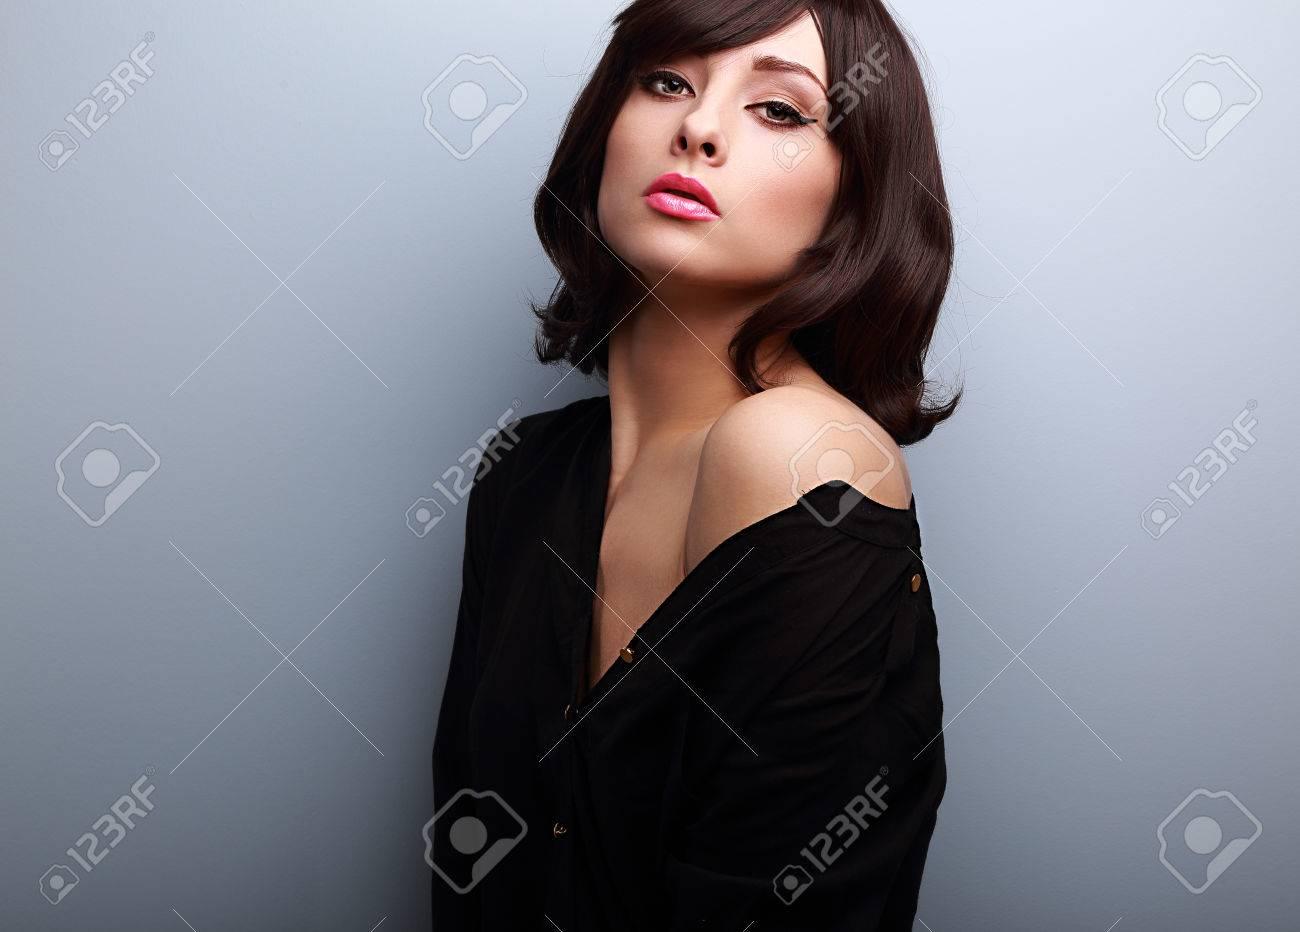 Sexy Short Hair Female Model Posing In Black Shirt On Blue